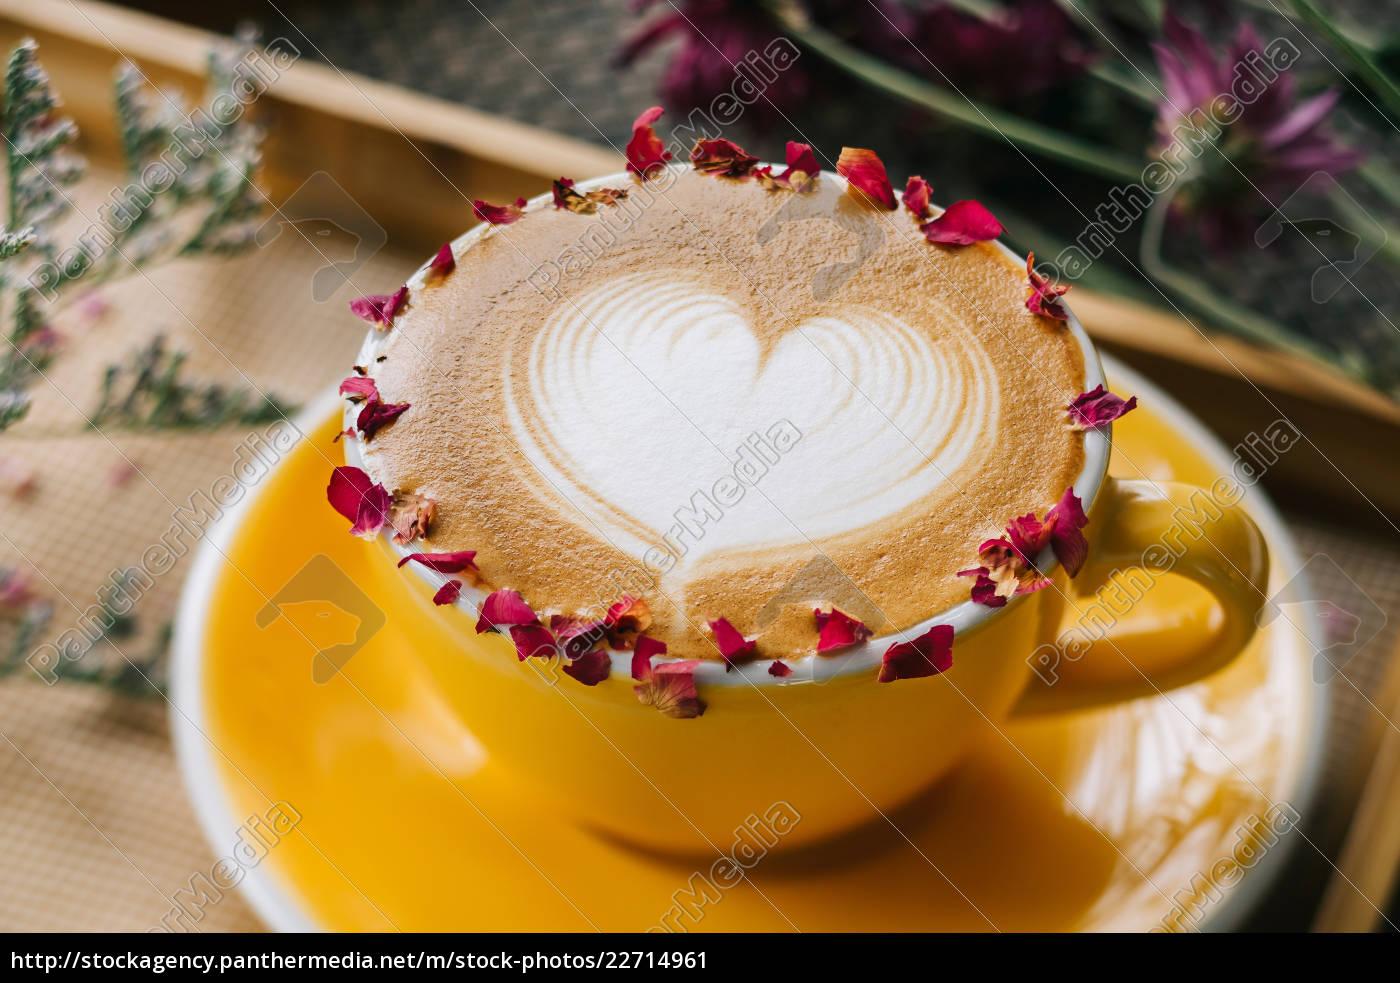 coffee, latte - 22714961